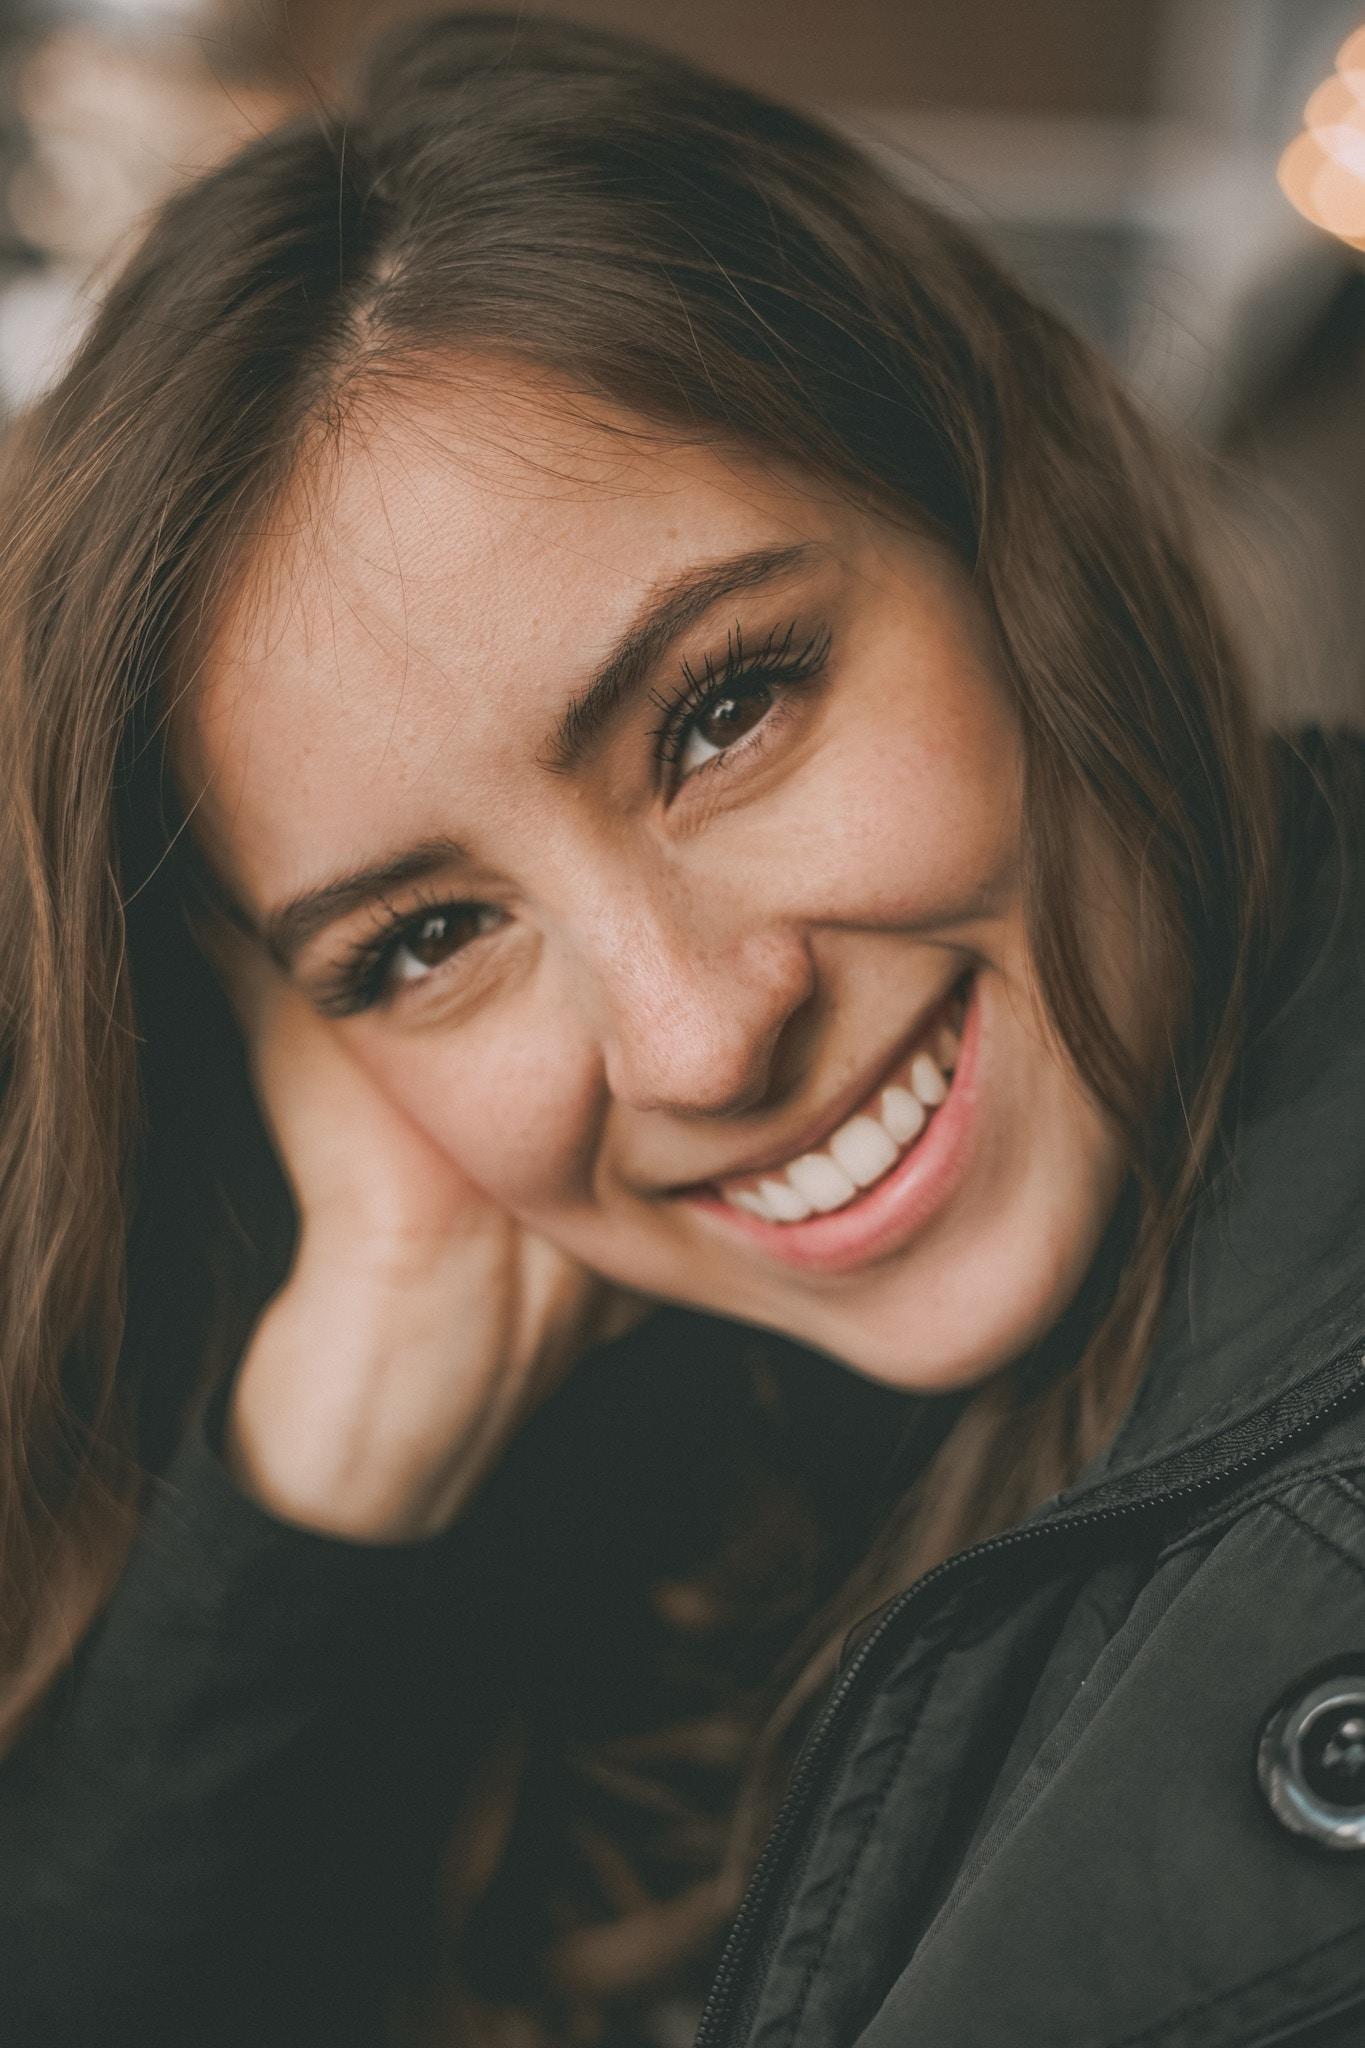 Avatar of user Samantha Hentosh